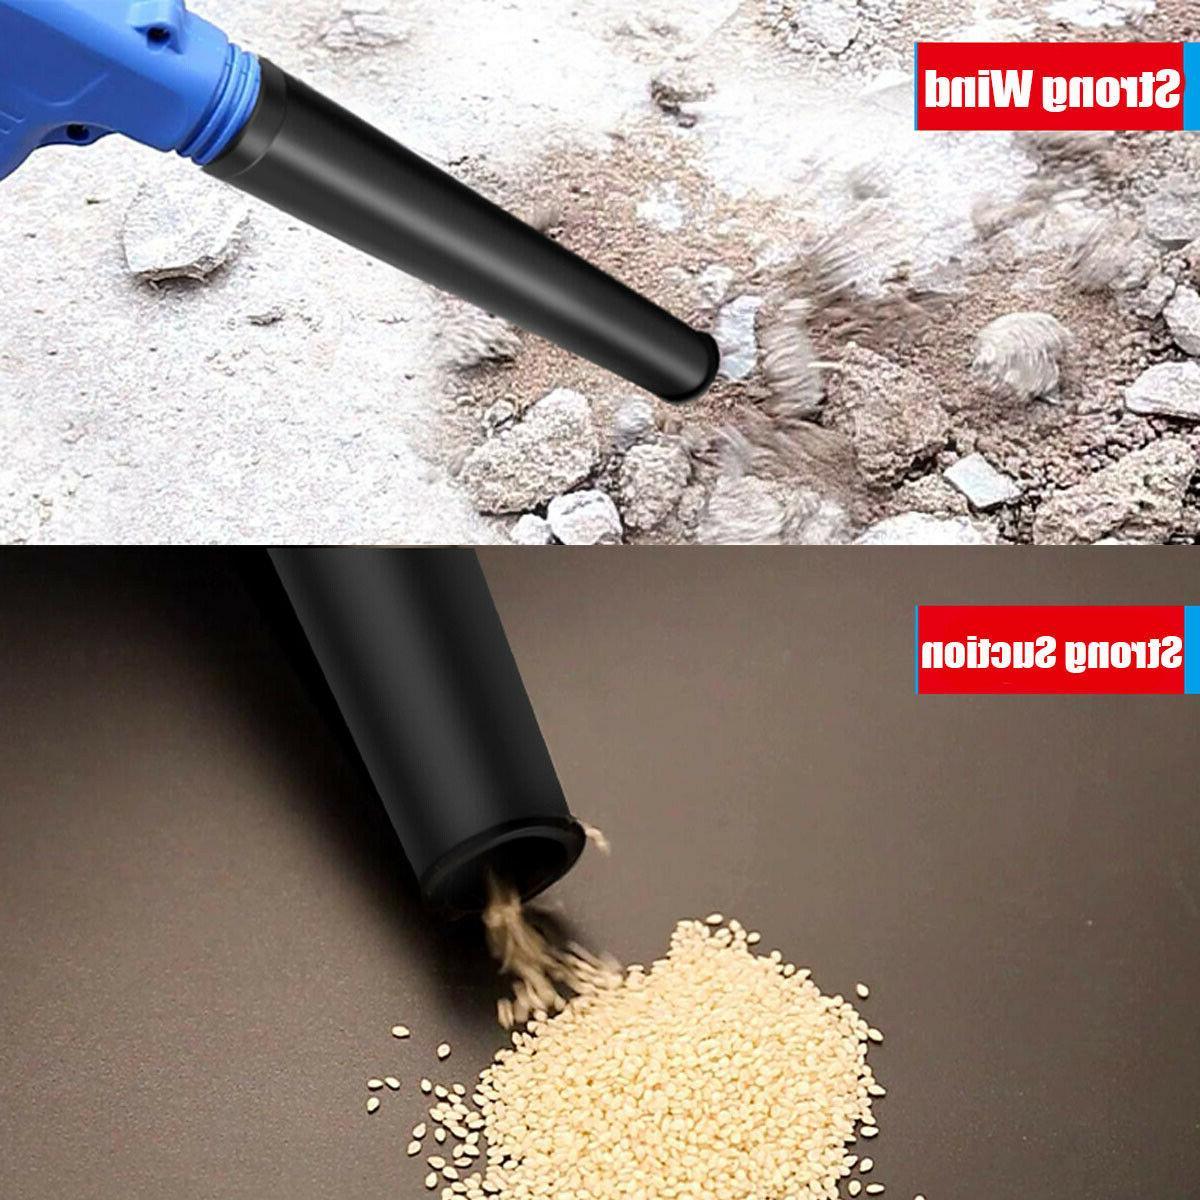 2 Leaf Dust Blower Tool For 18V